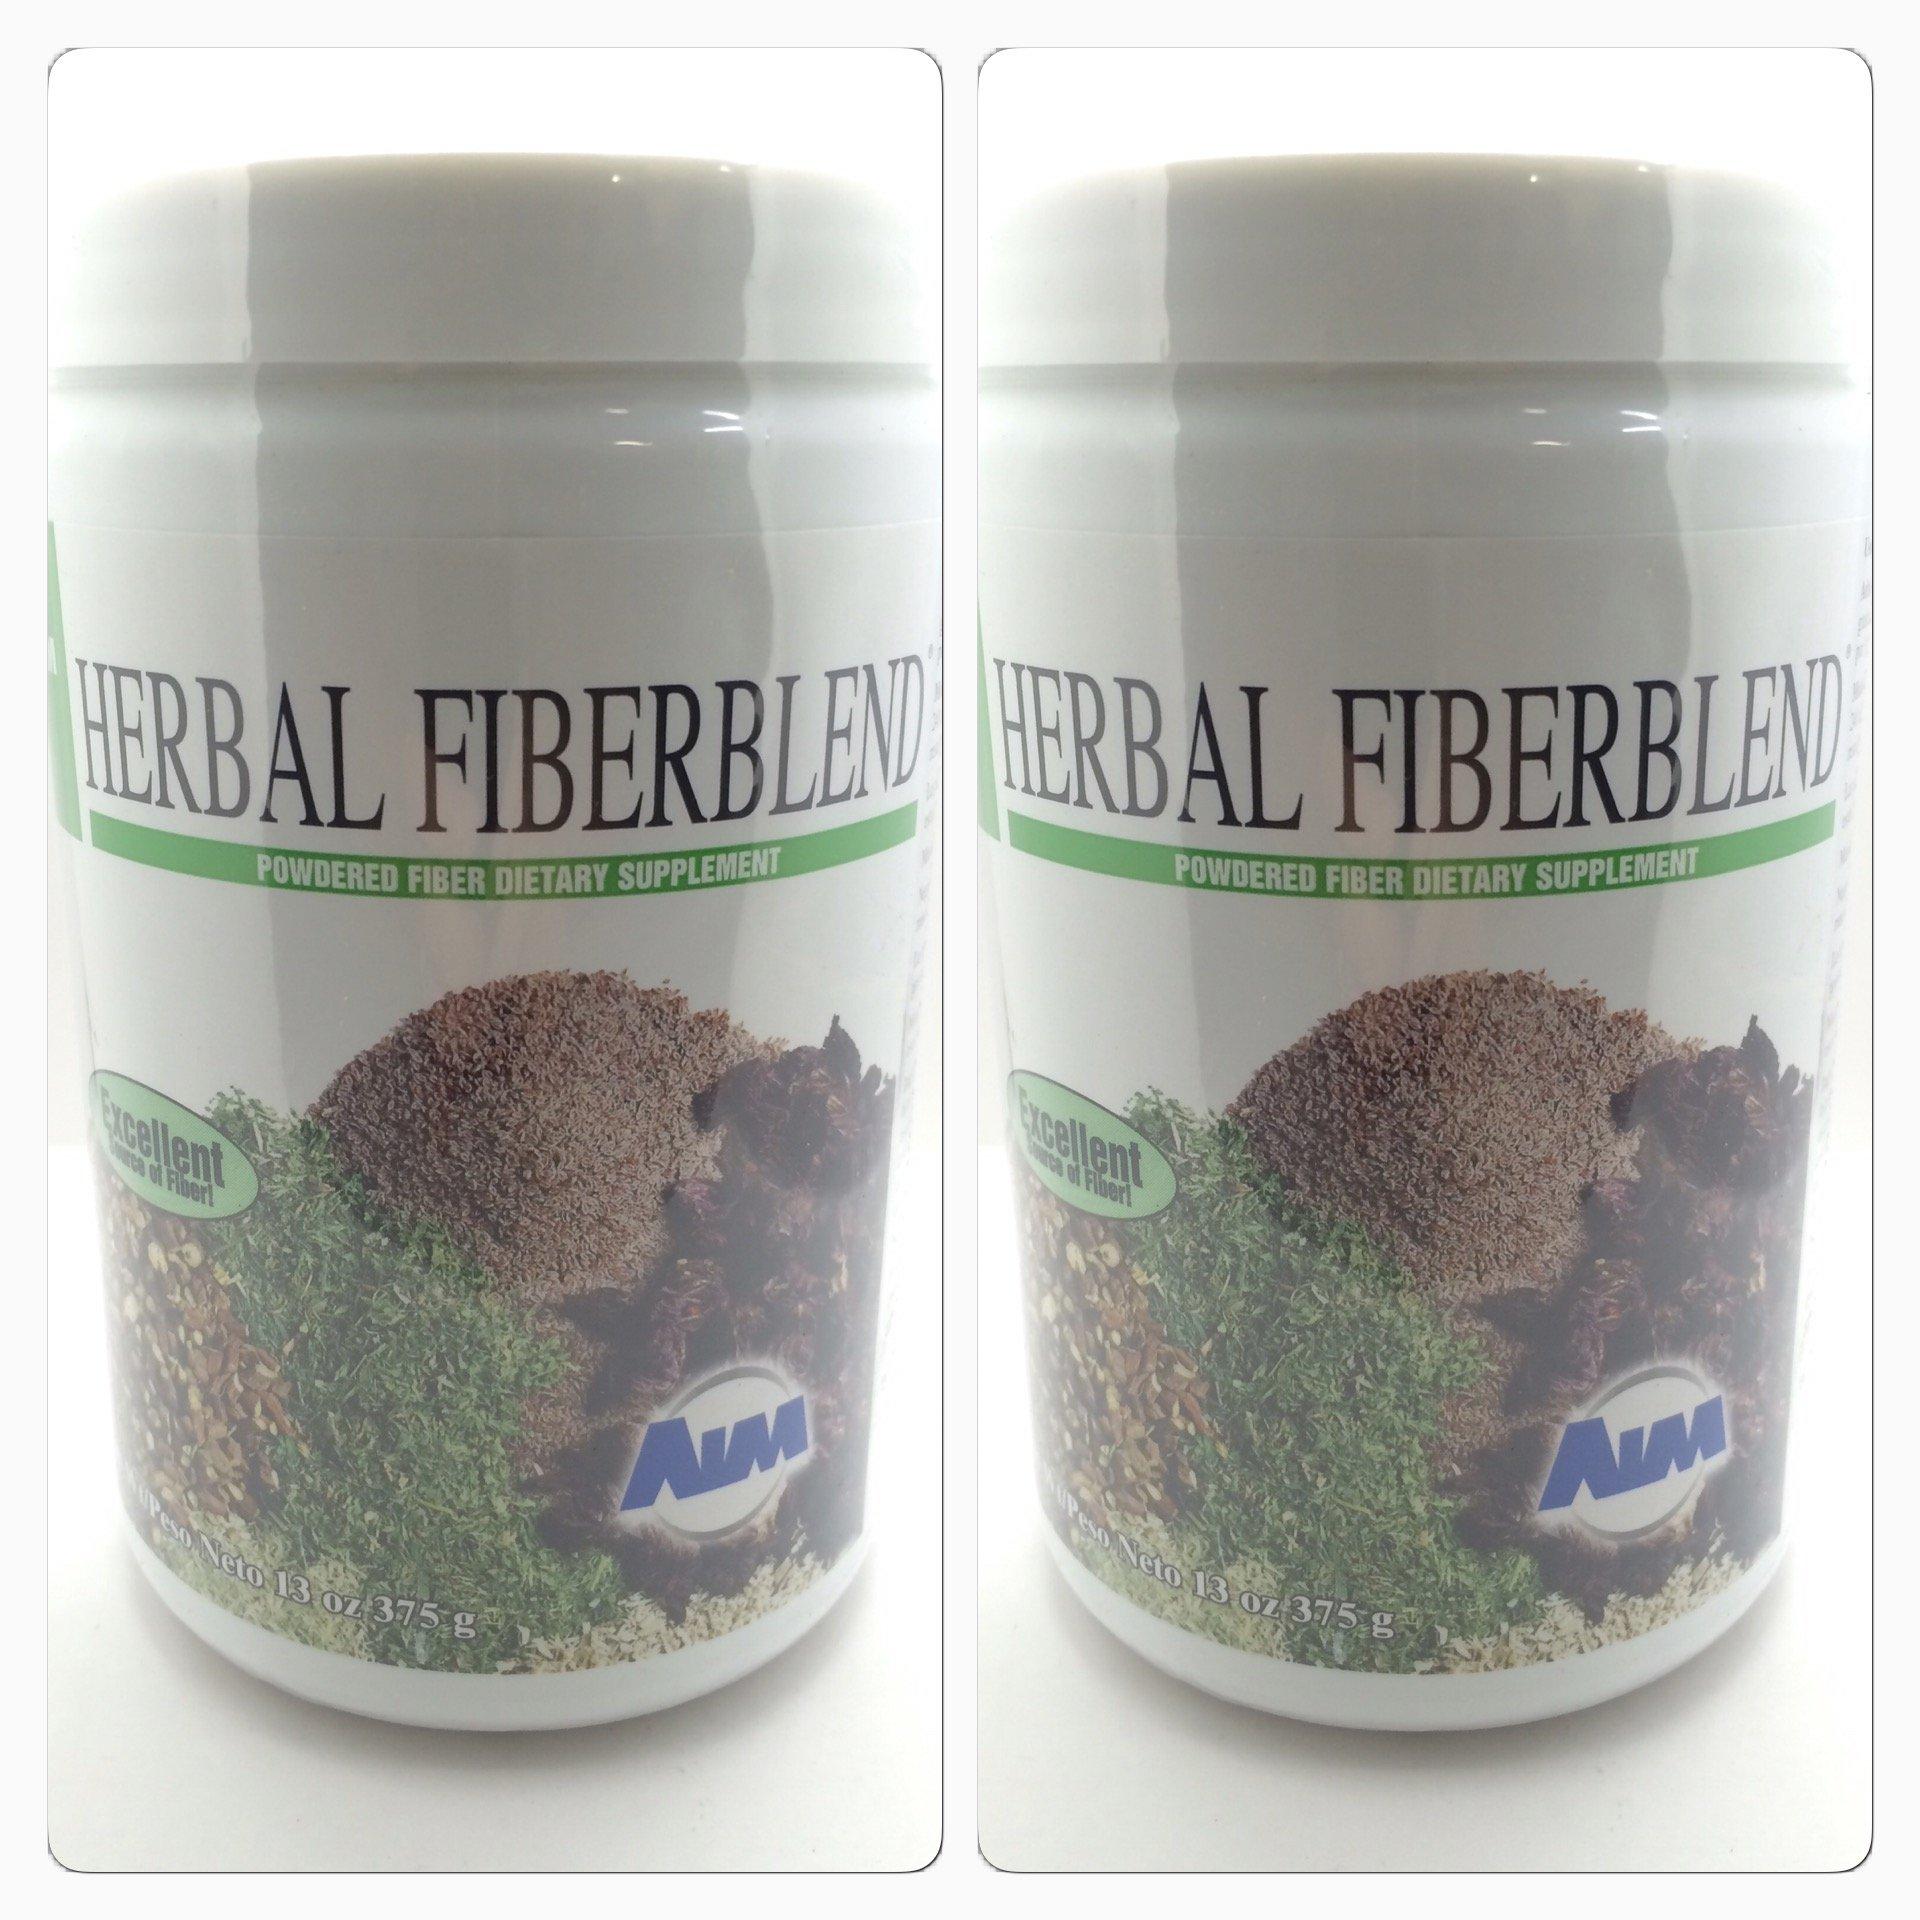 AIM Herbal Fiberblend Unflavored Powder 13 Oz (Two Pack)